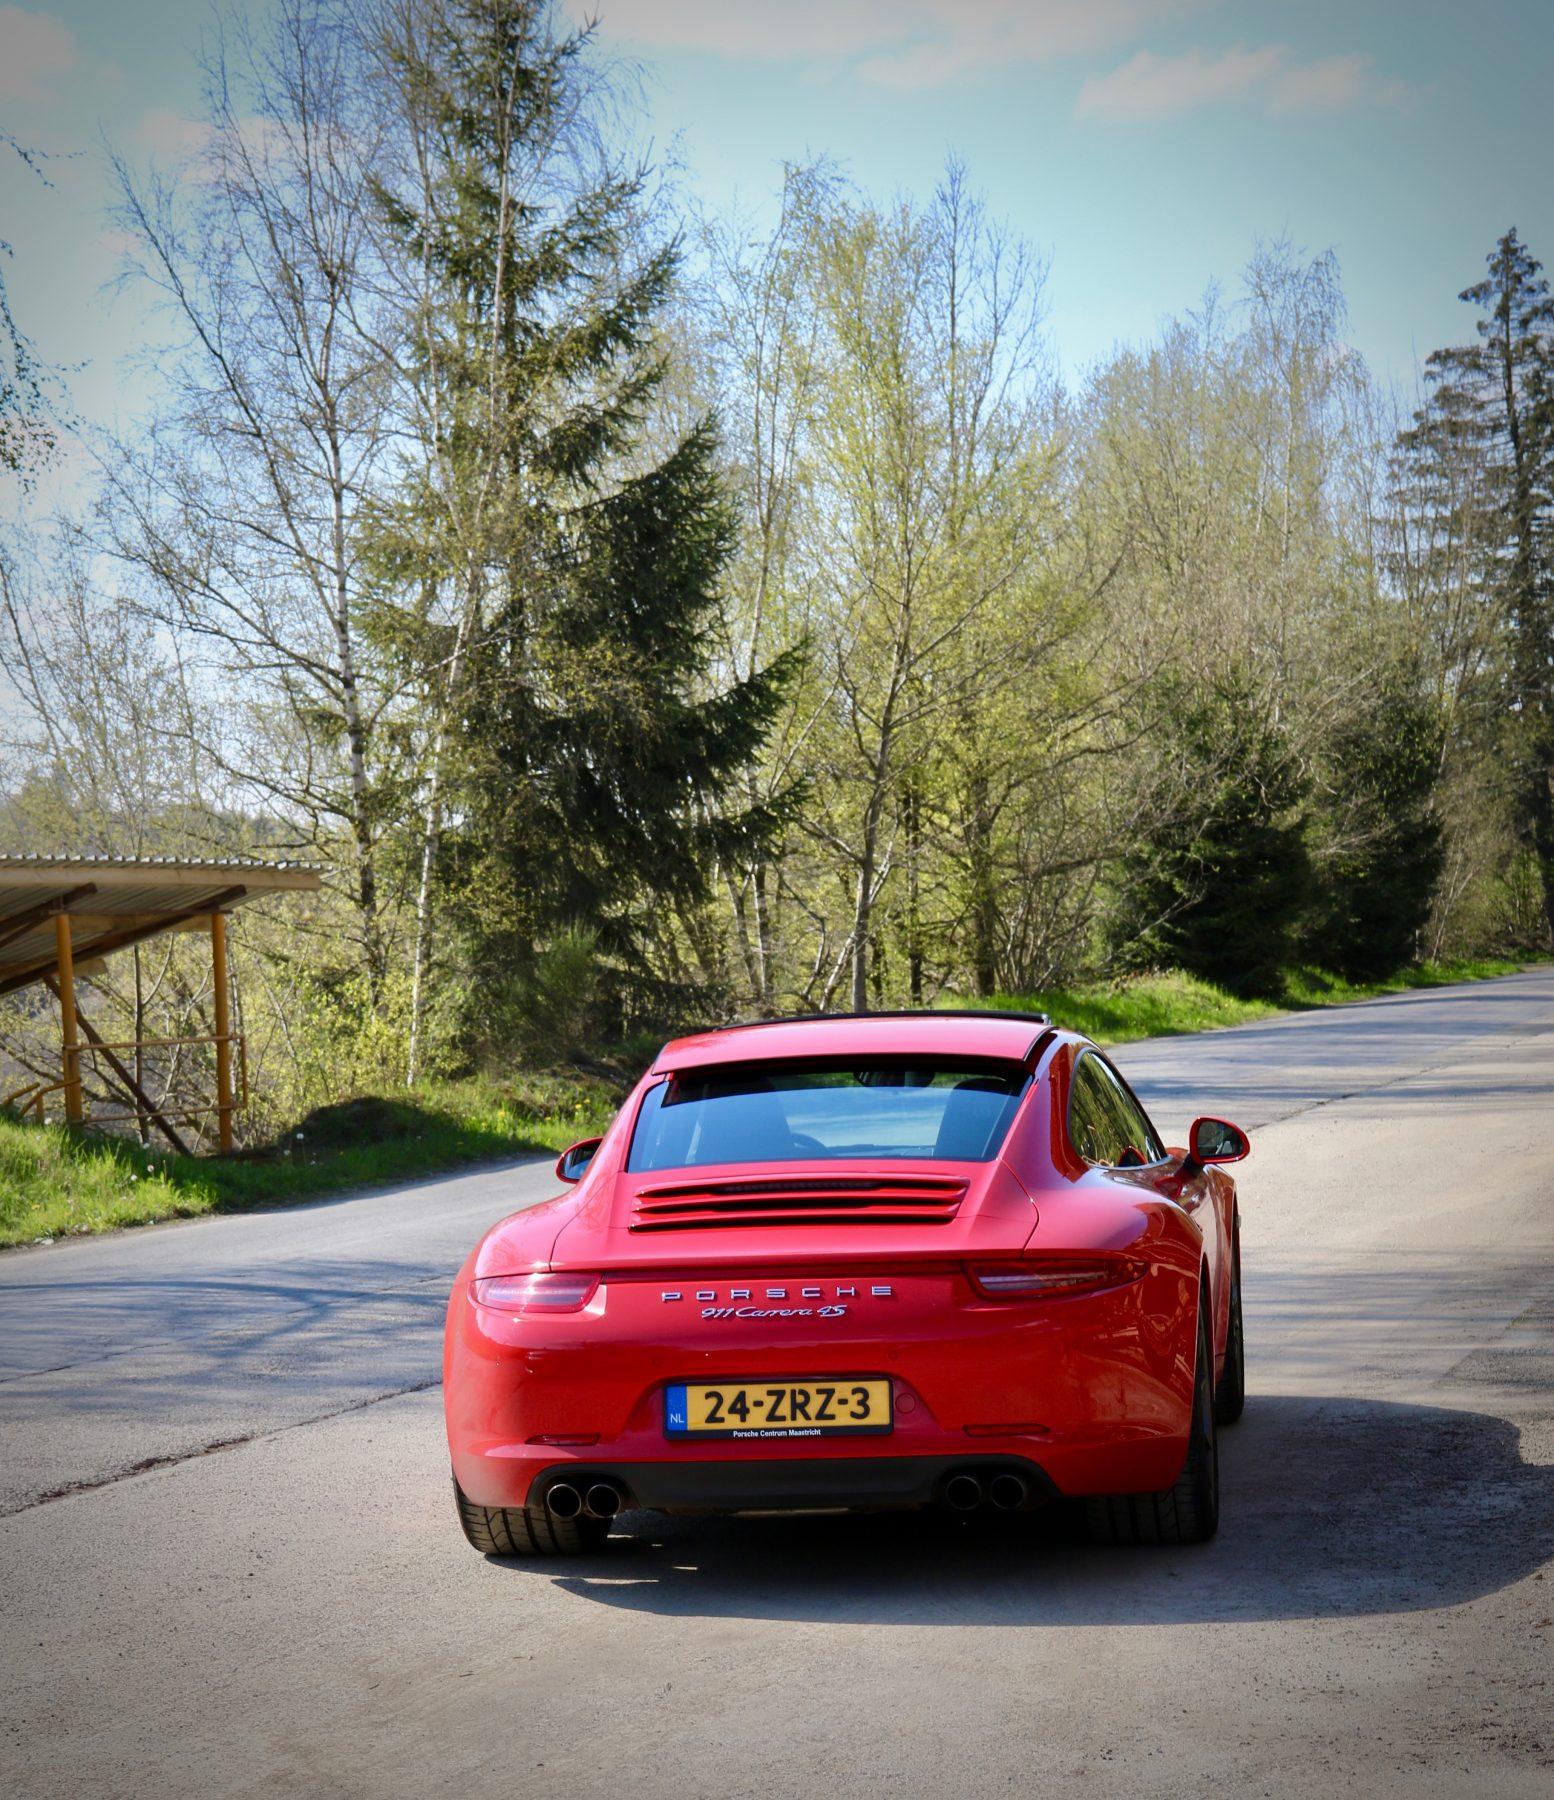 Porsche in autoreis Eifel ardennen van dolf dekking driving events